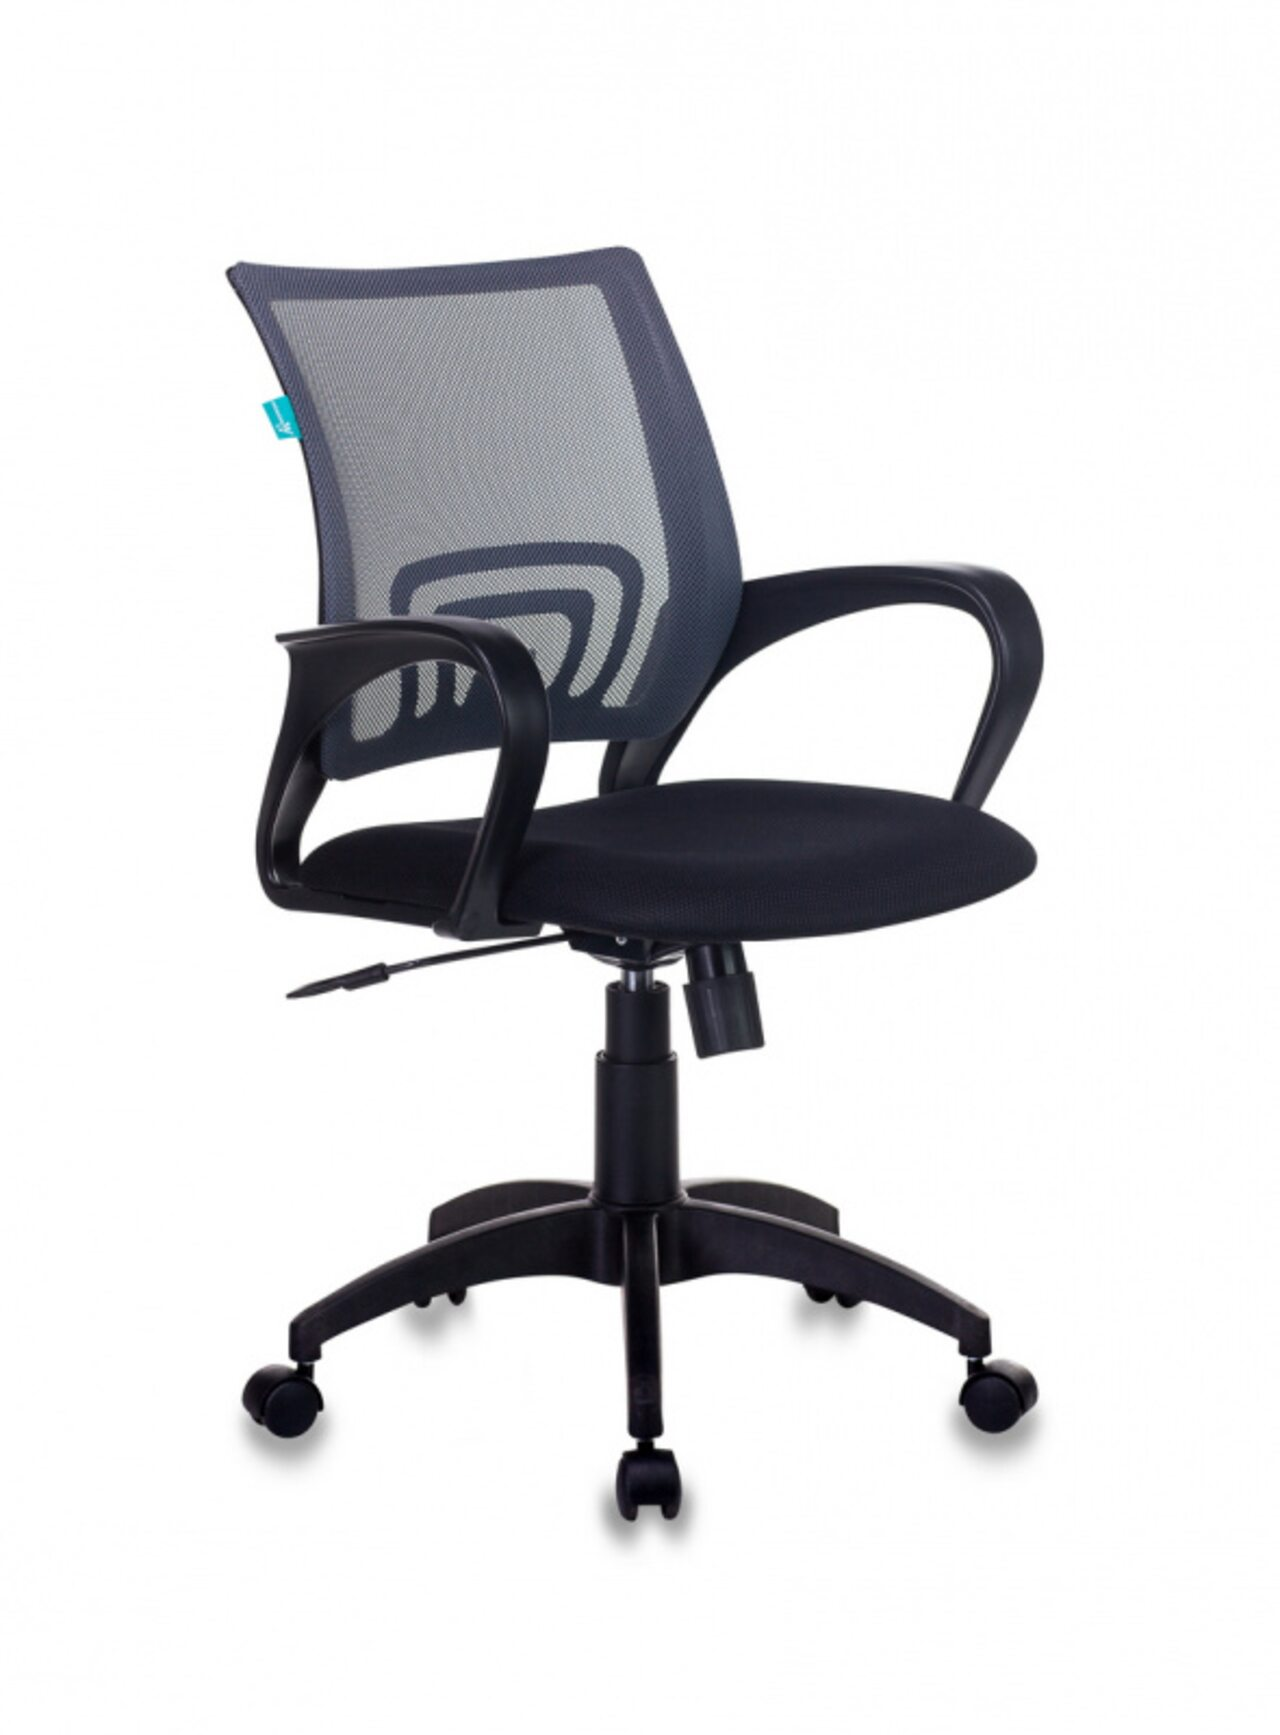 Кресло для персонала CH-695N/ - фото 3